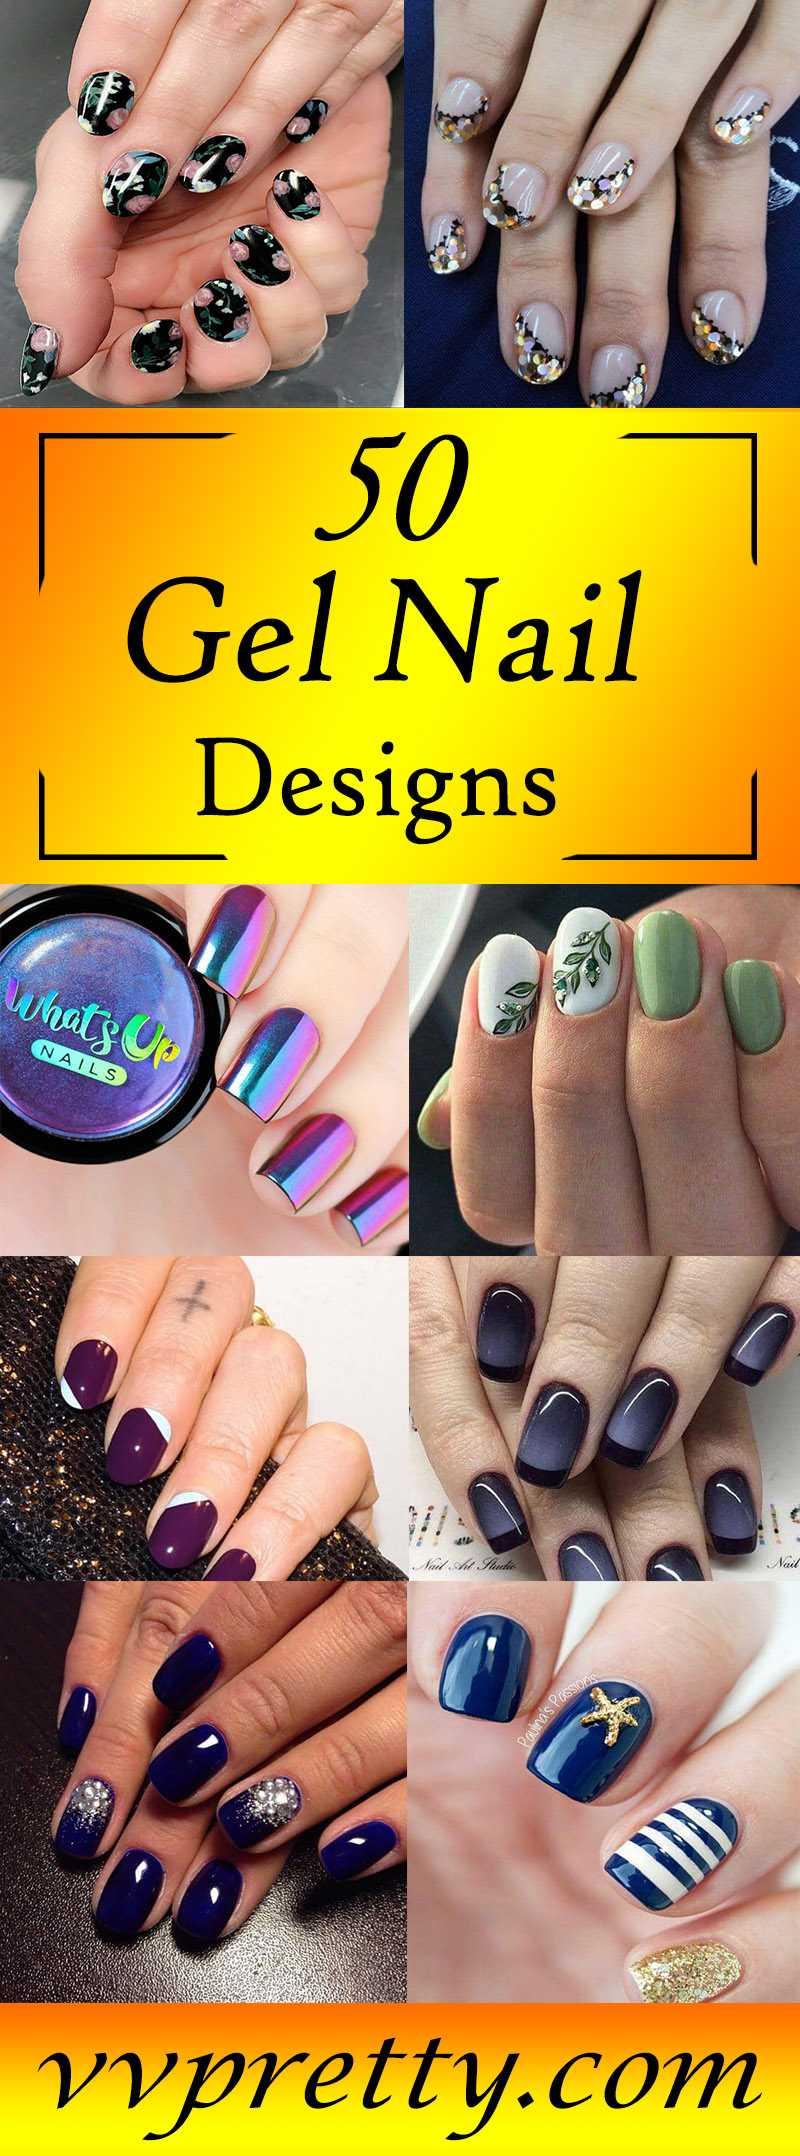 top Gel nail design 2019 vvpretty